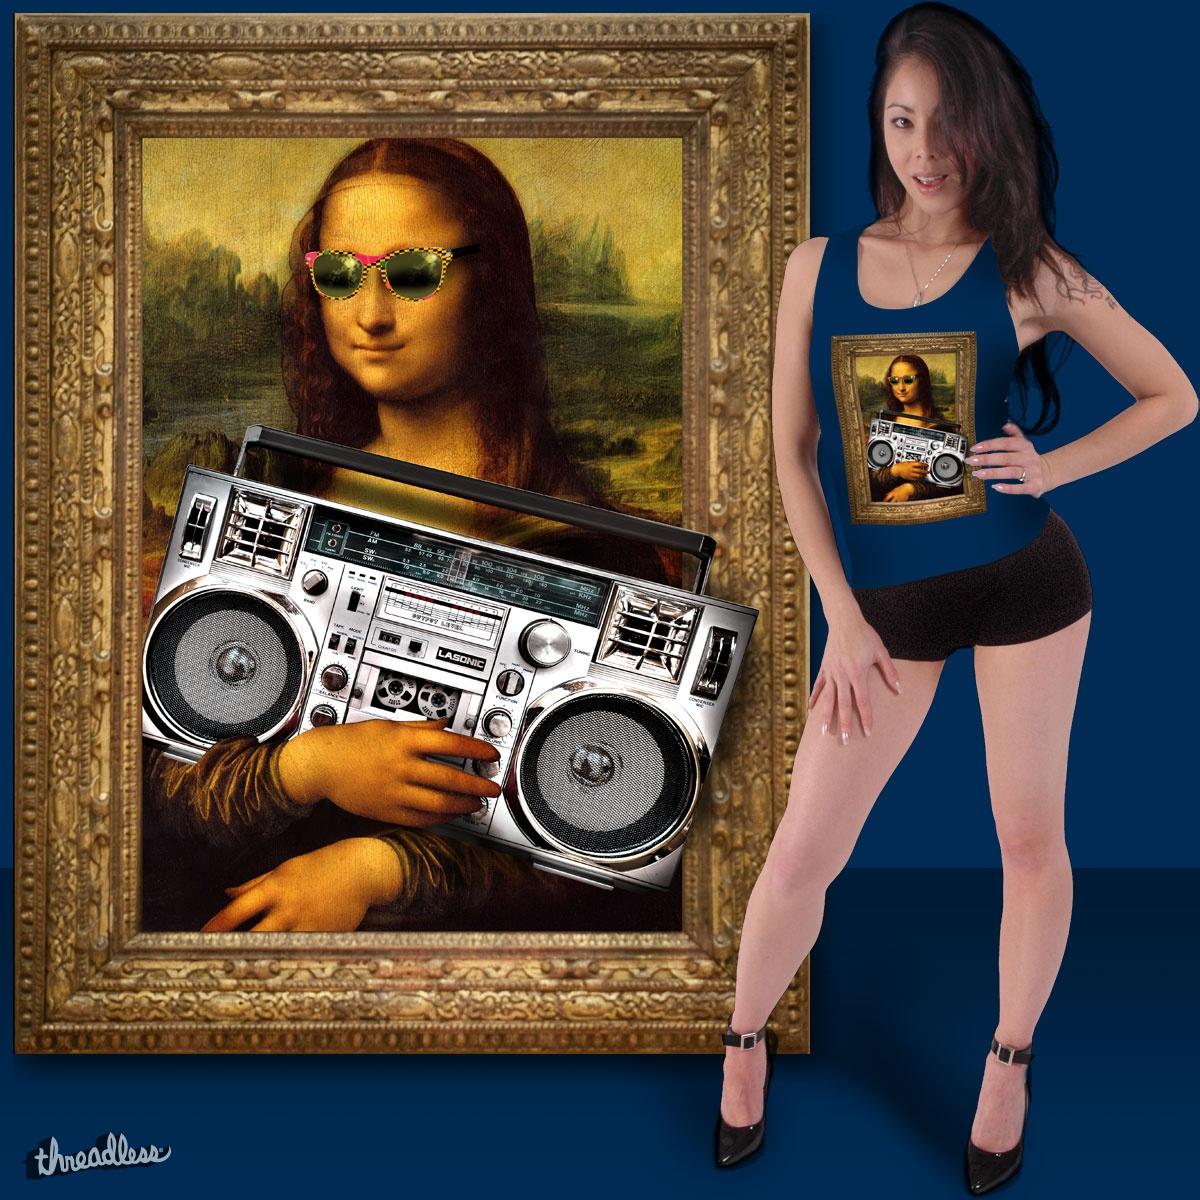 Mona Lasonic by billtracyphoto on Threadless